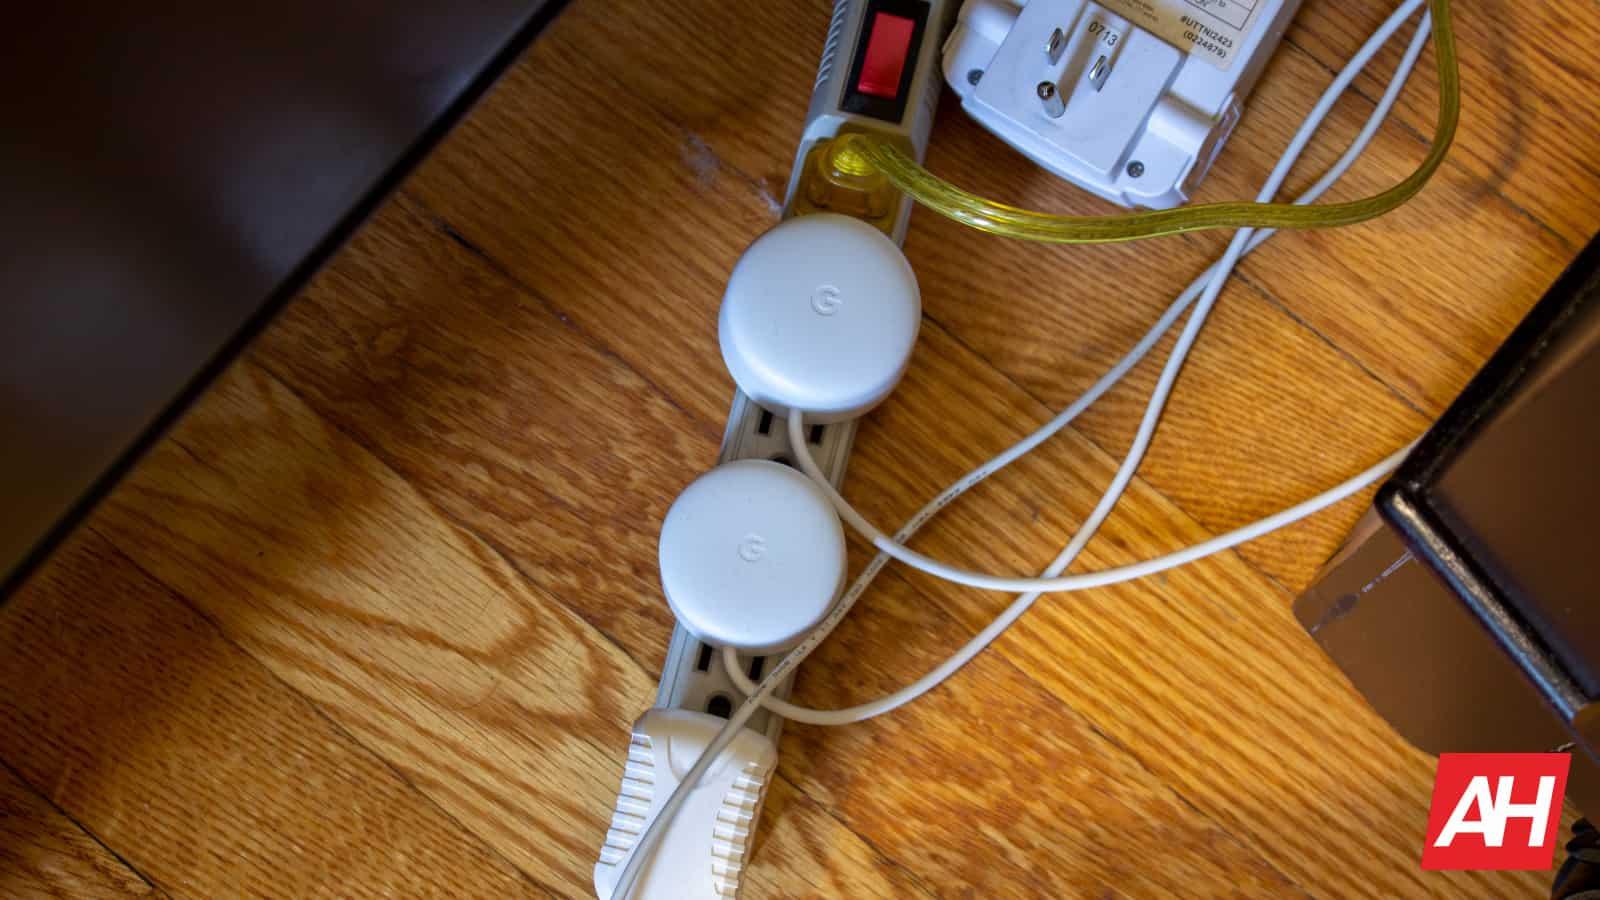 Google Home Hub New Logo AH NS 08 power plug